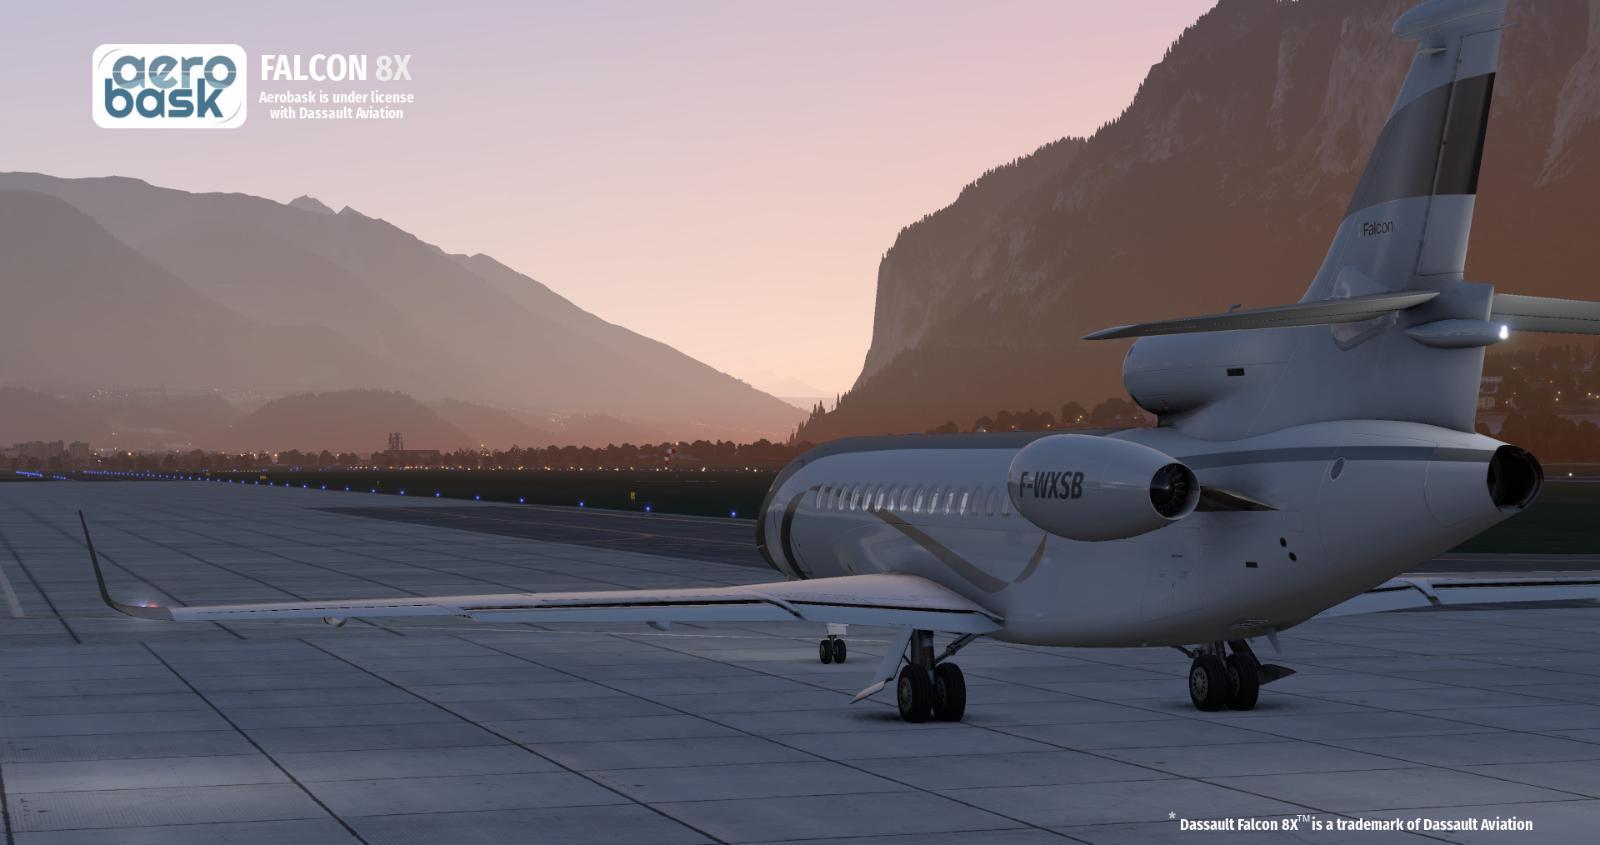 434125491_Aerobask_F8X_1.jpg.ef2415704e6848c985132b02dde7102e